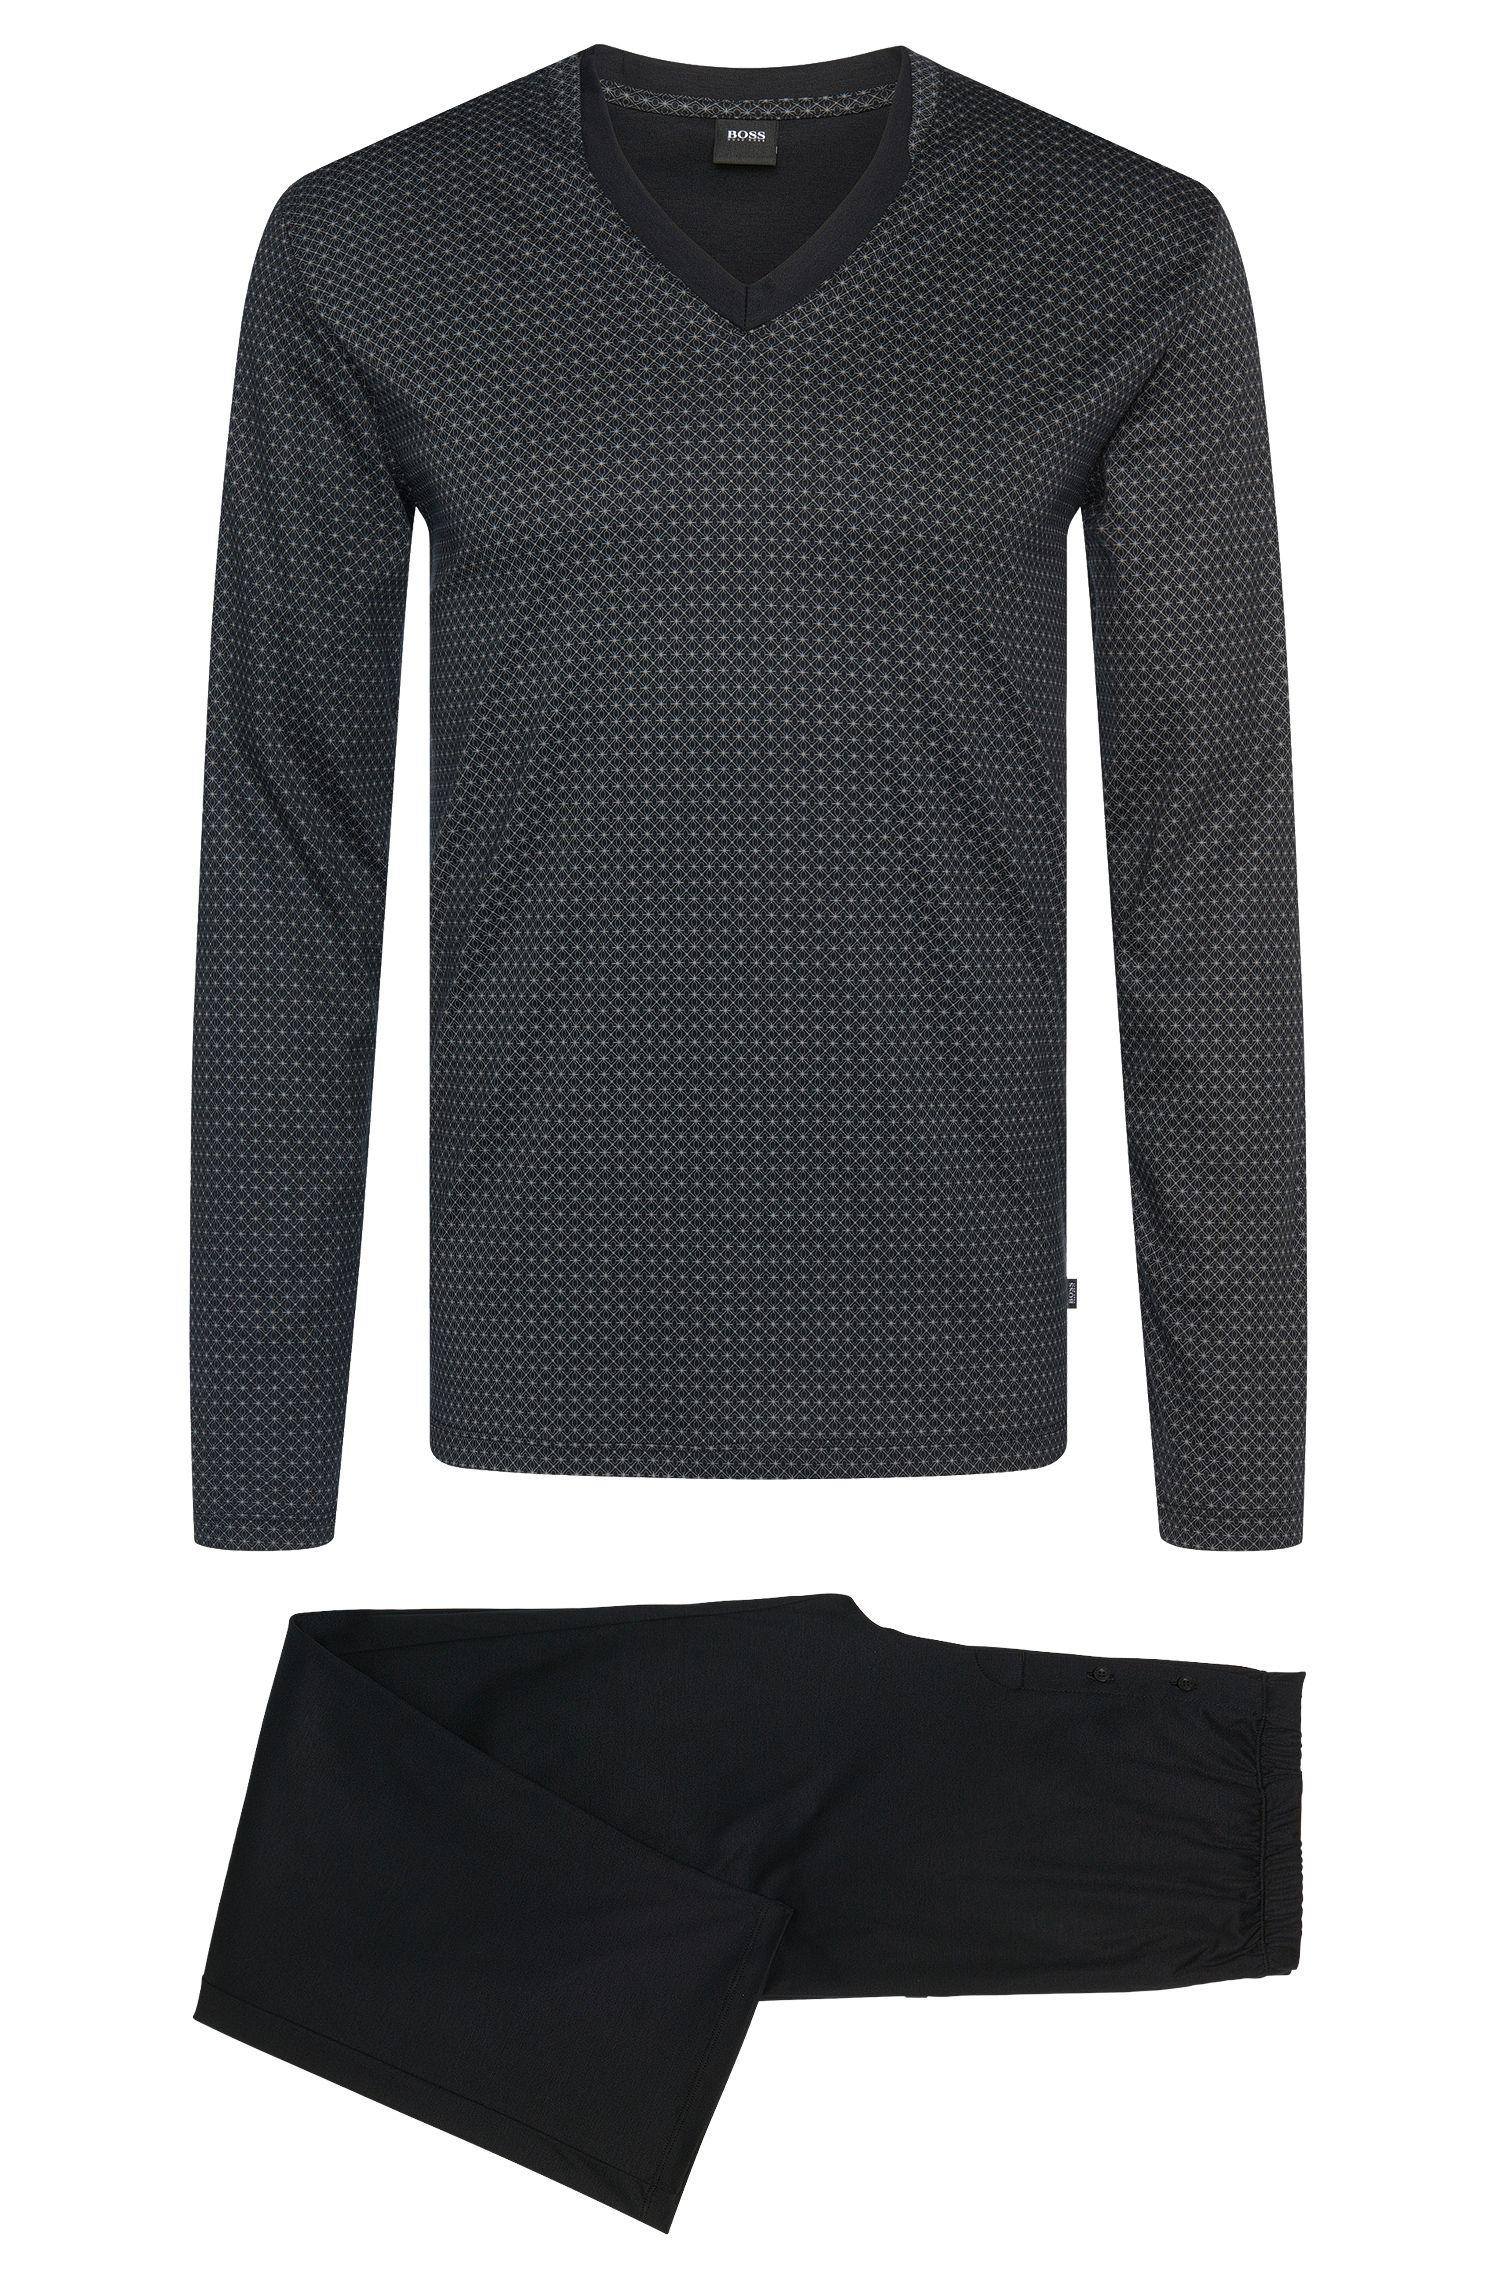 'Set Long' | Cotton Modal Pajama Set